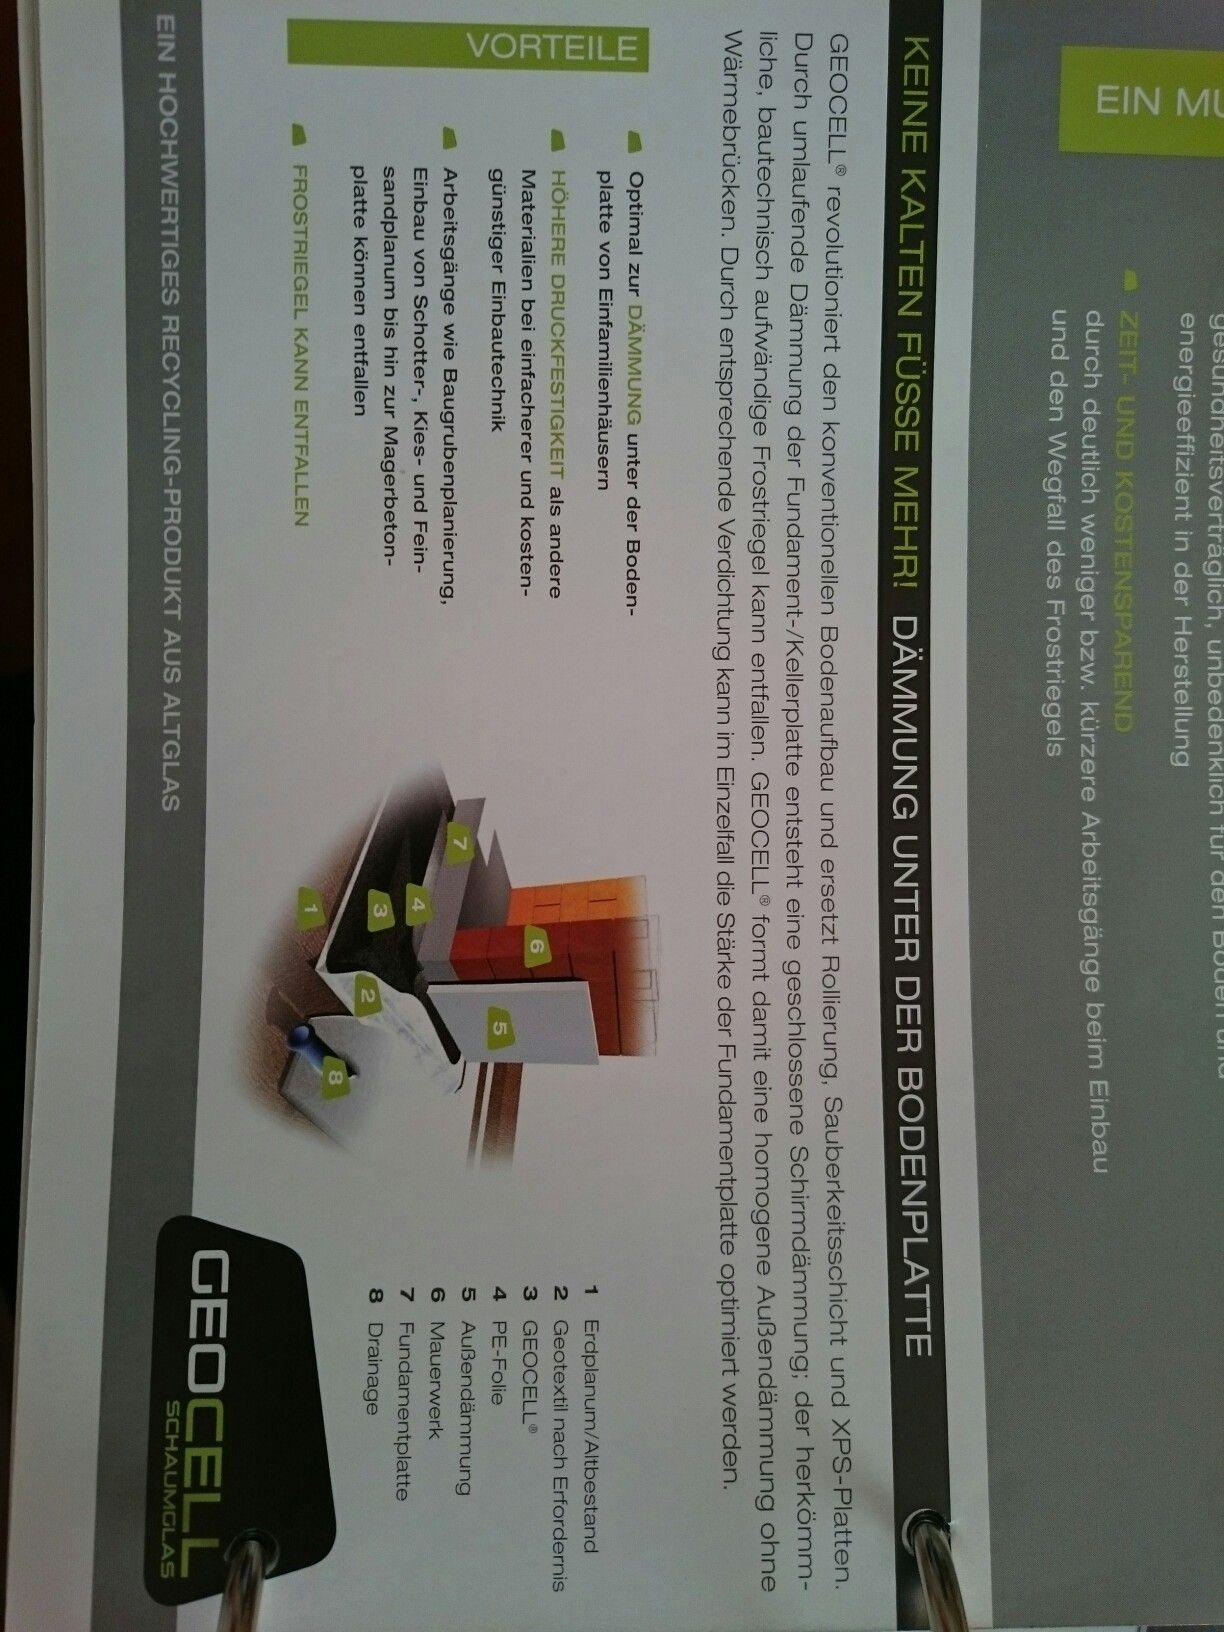 Pin Von Hufnagl Julian Auf Ideen Fur Unser Haus Energie Technik Recycling